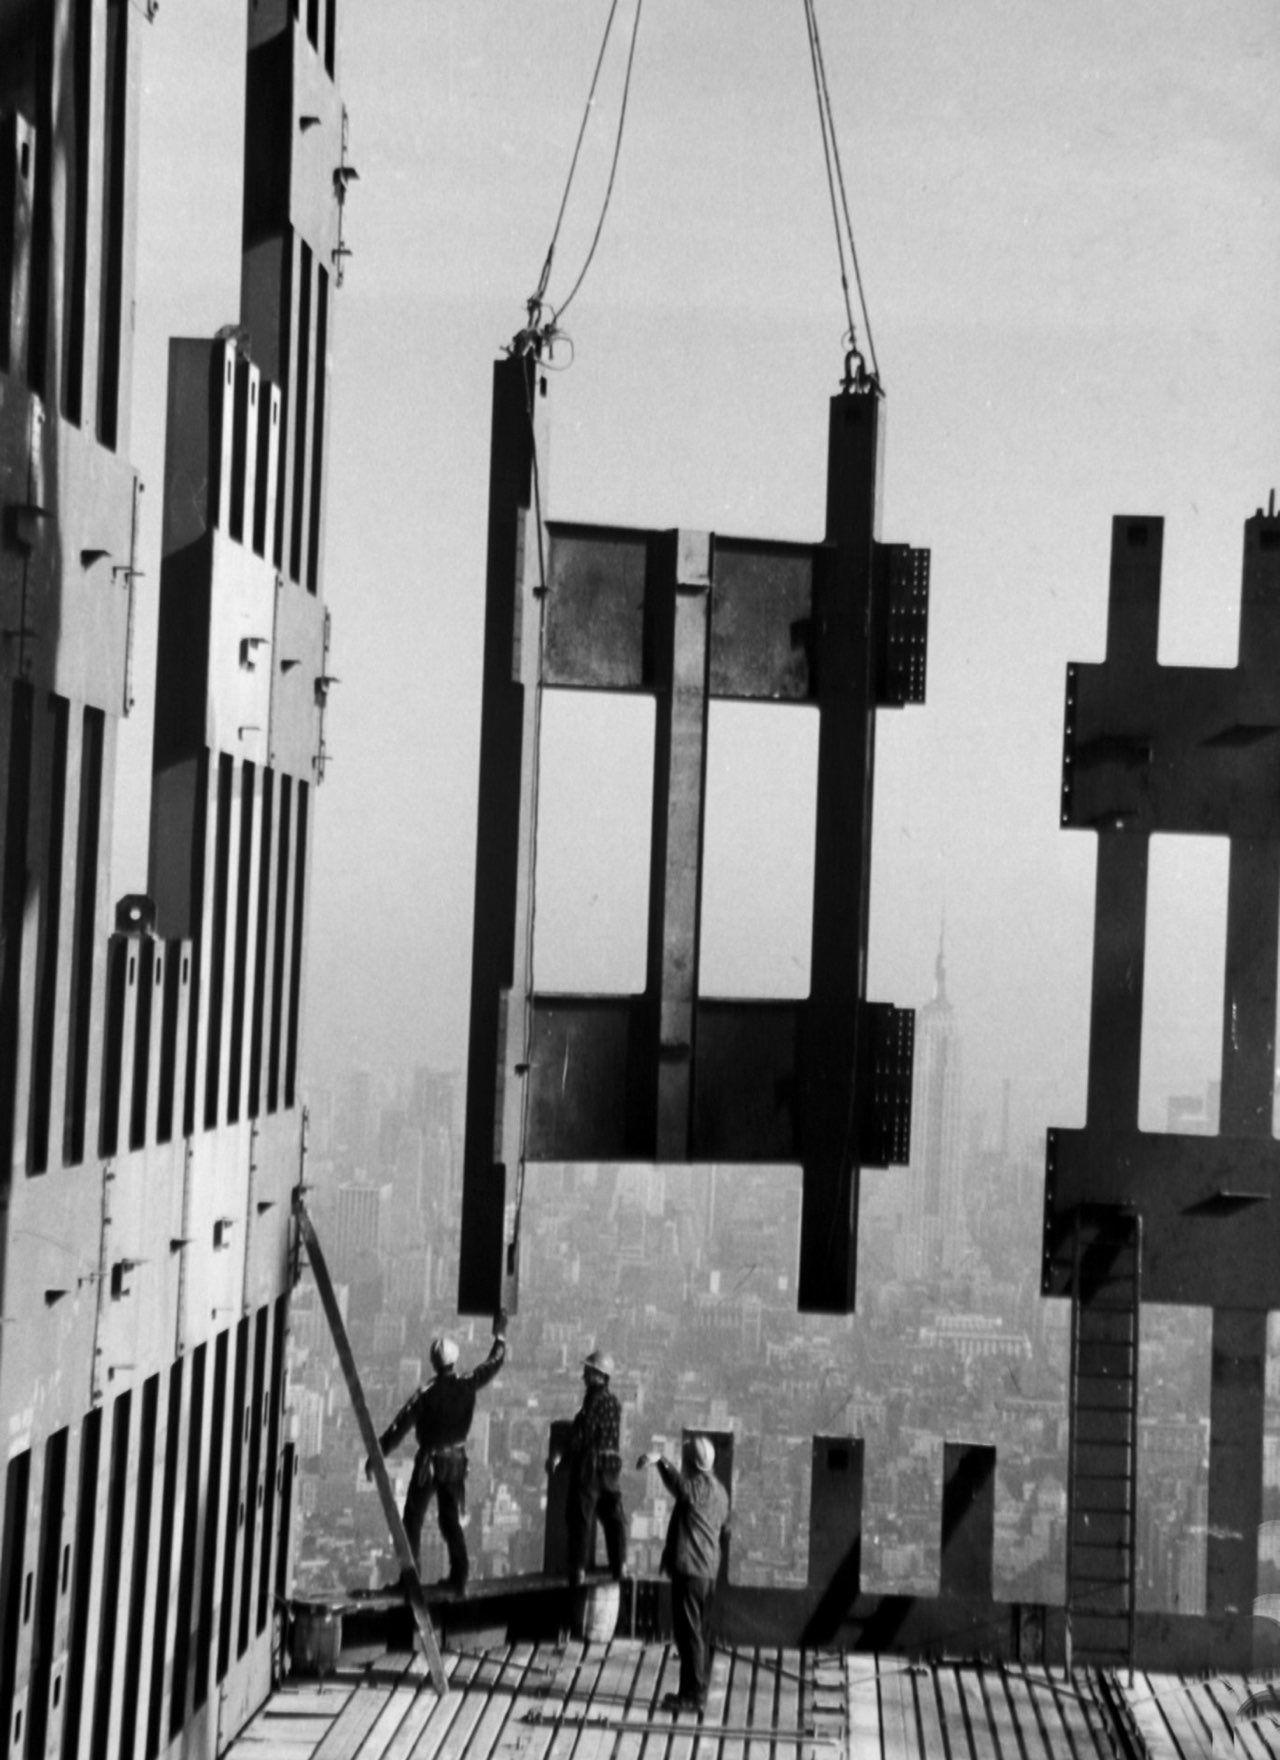 World Trade Center J. Witkins Jesse Seegers Carol Willis Stream 02 PCA-STREAM